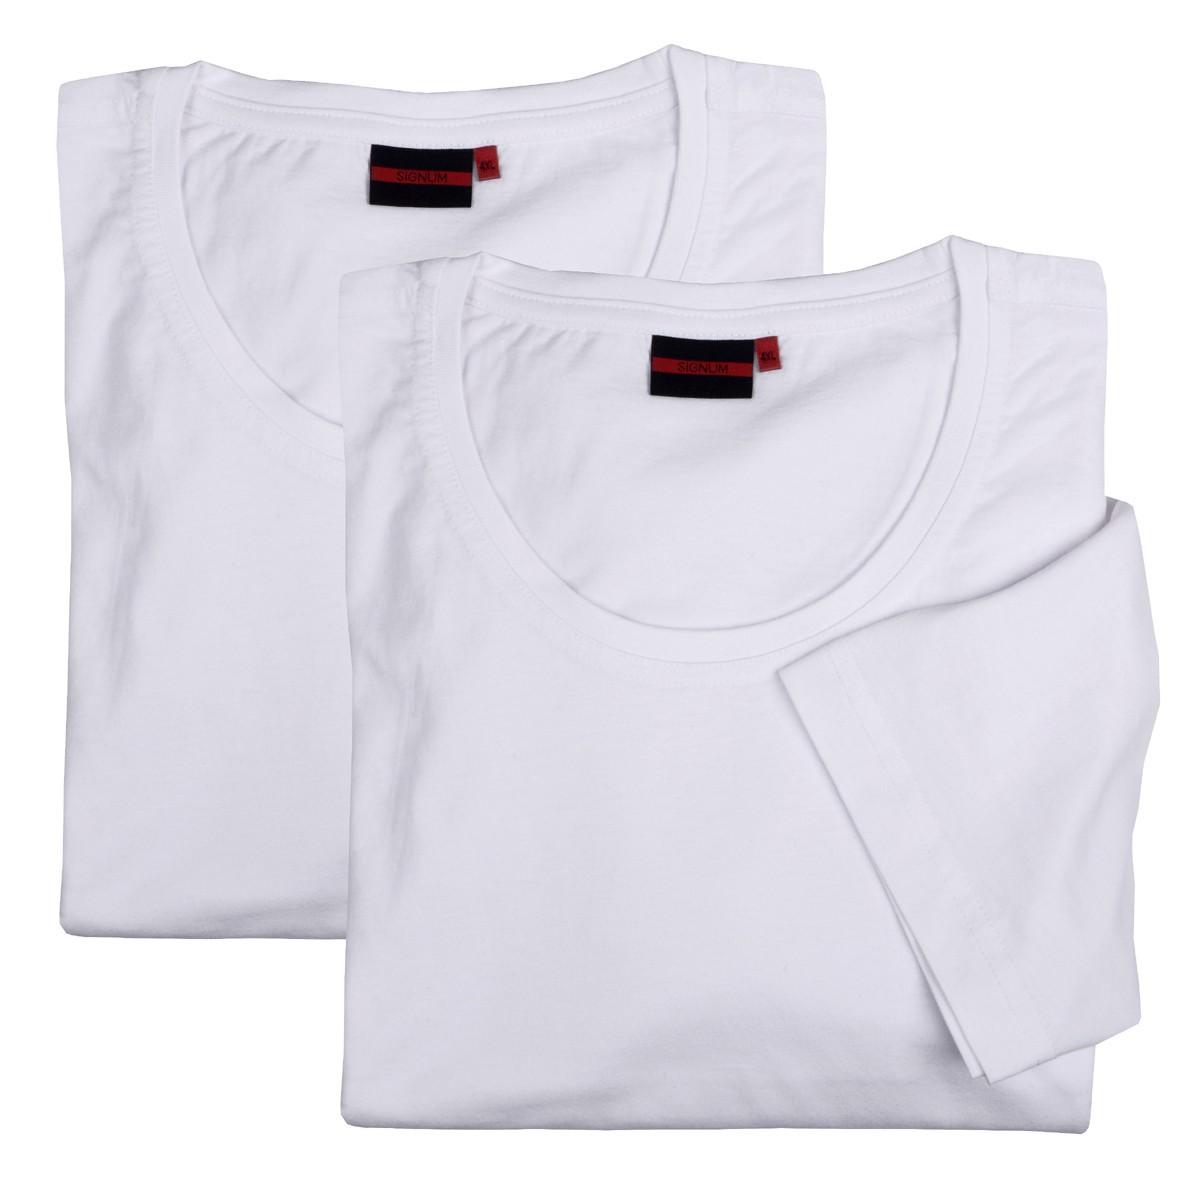 signum doppelpack xxl rundhals t shirt wei bergr en 2xl. Black Bedroom Furniture Sets. Home Design Ideas